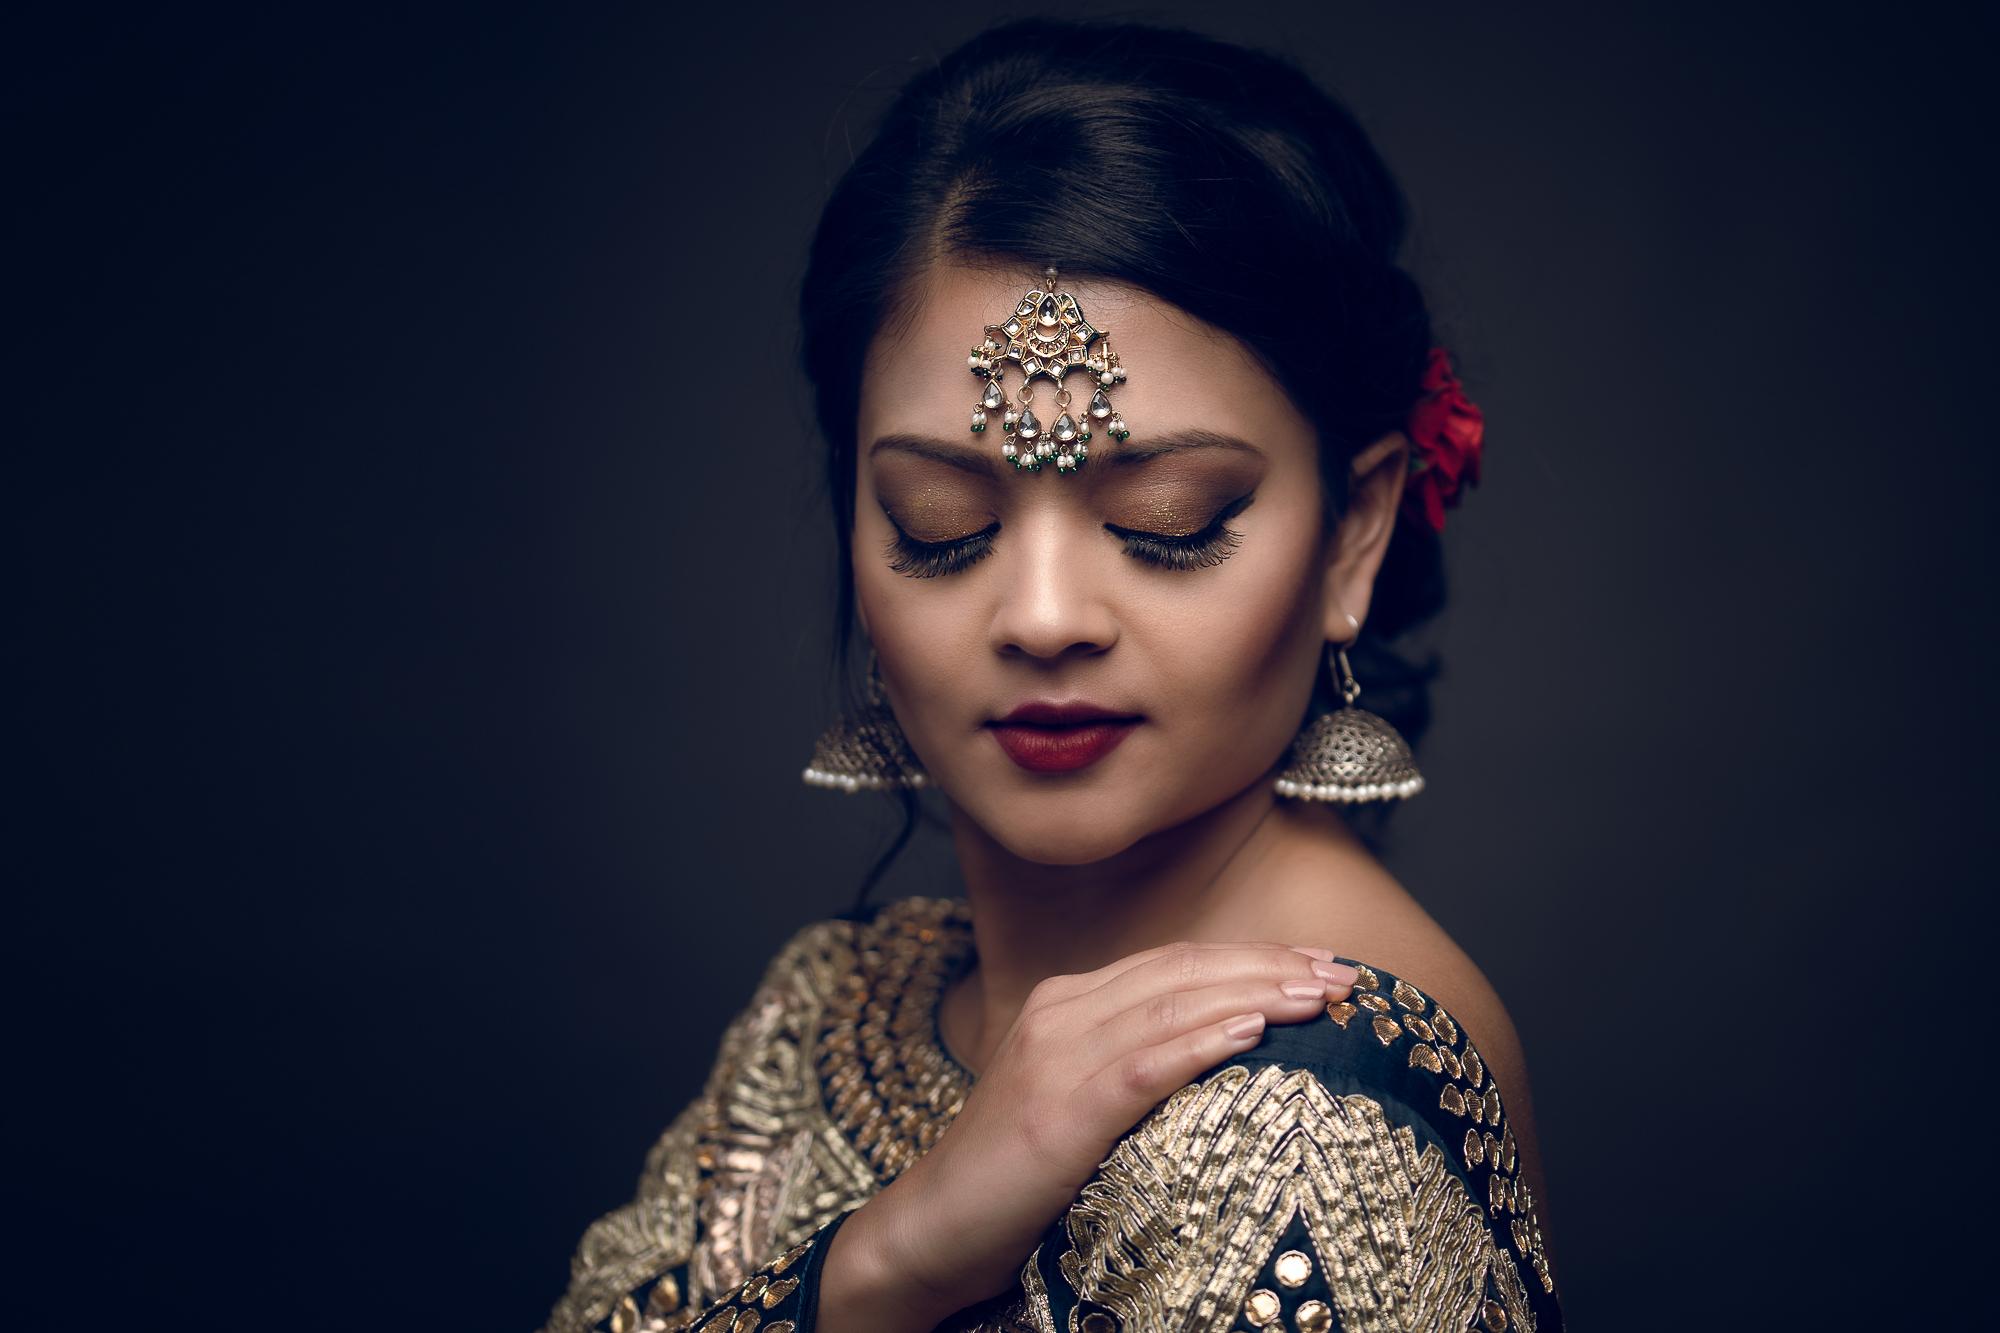 Atlanta Indian Photo Shoot